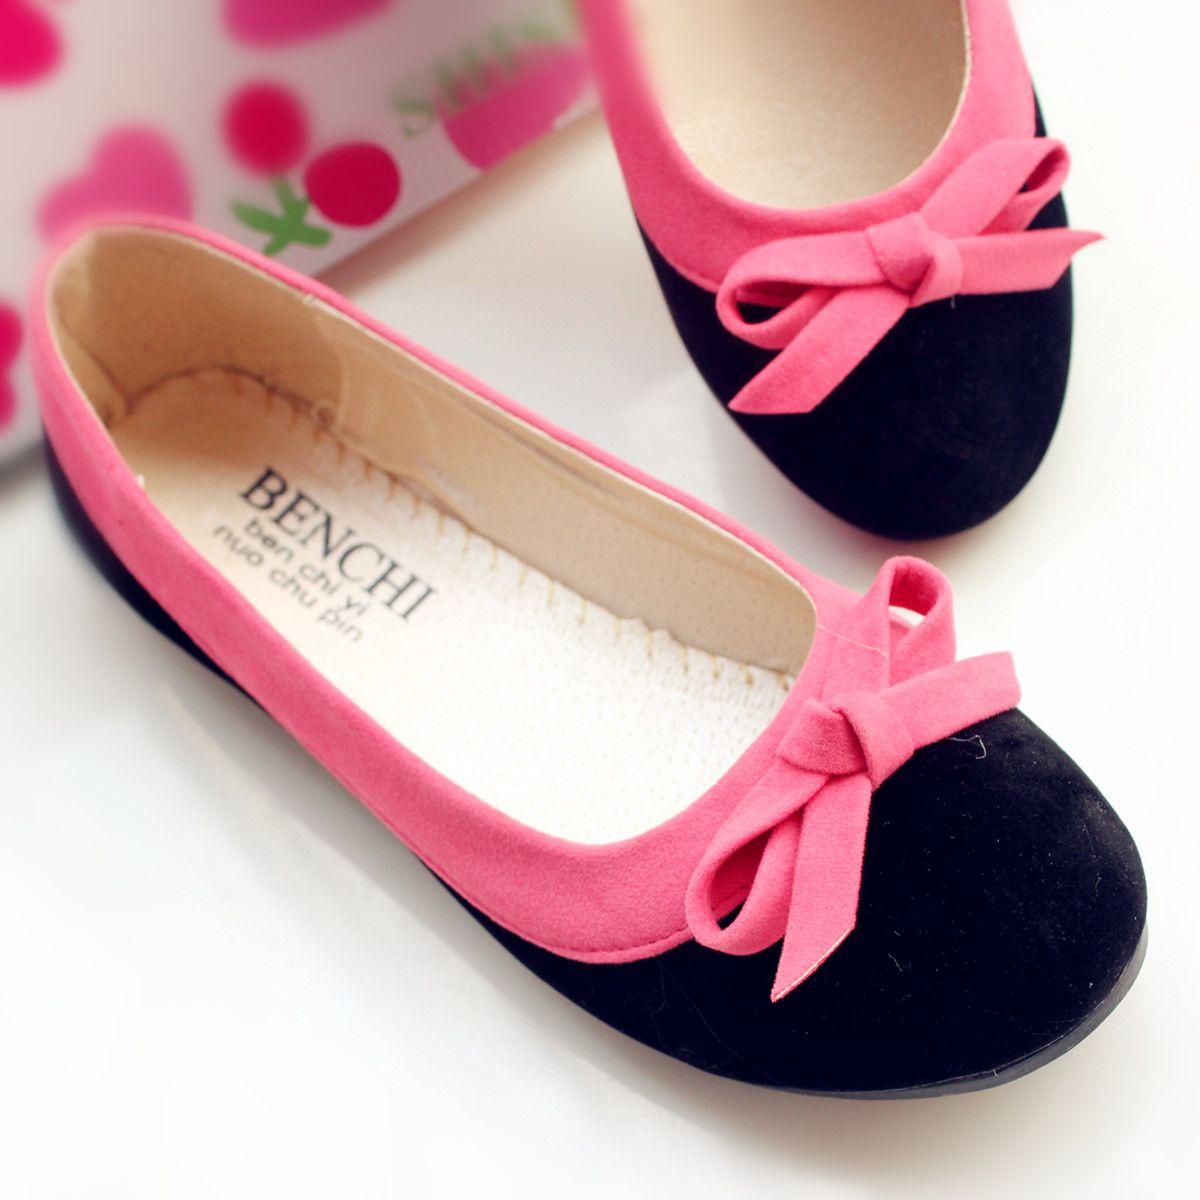 Fall New Pretty Big Bowknot Women's Flat Shoes: tidestore.com ...